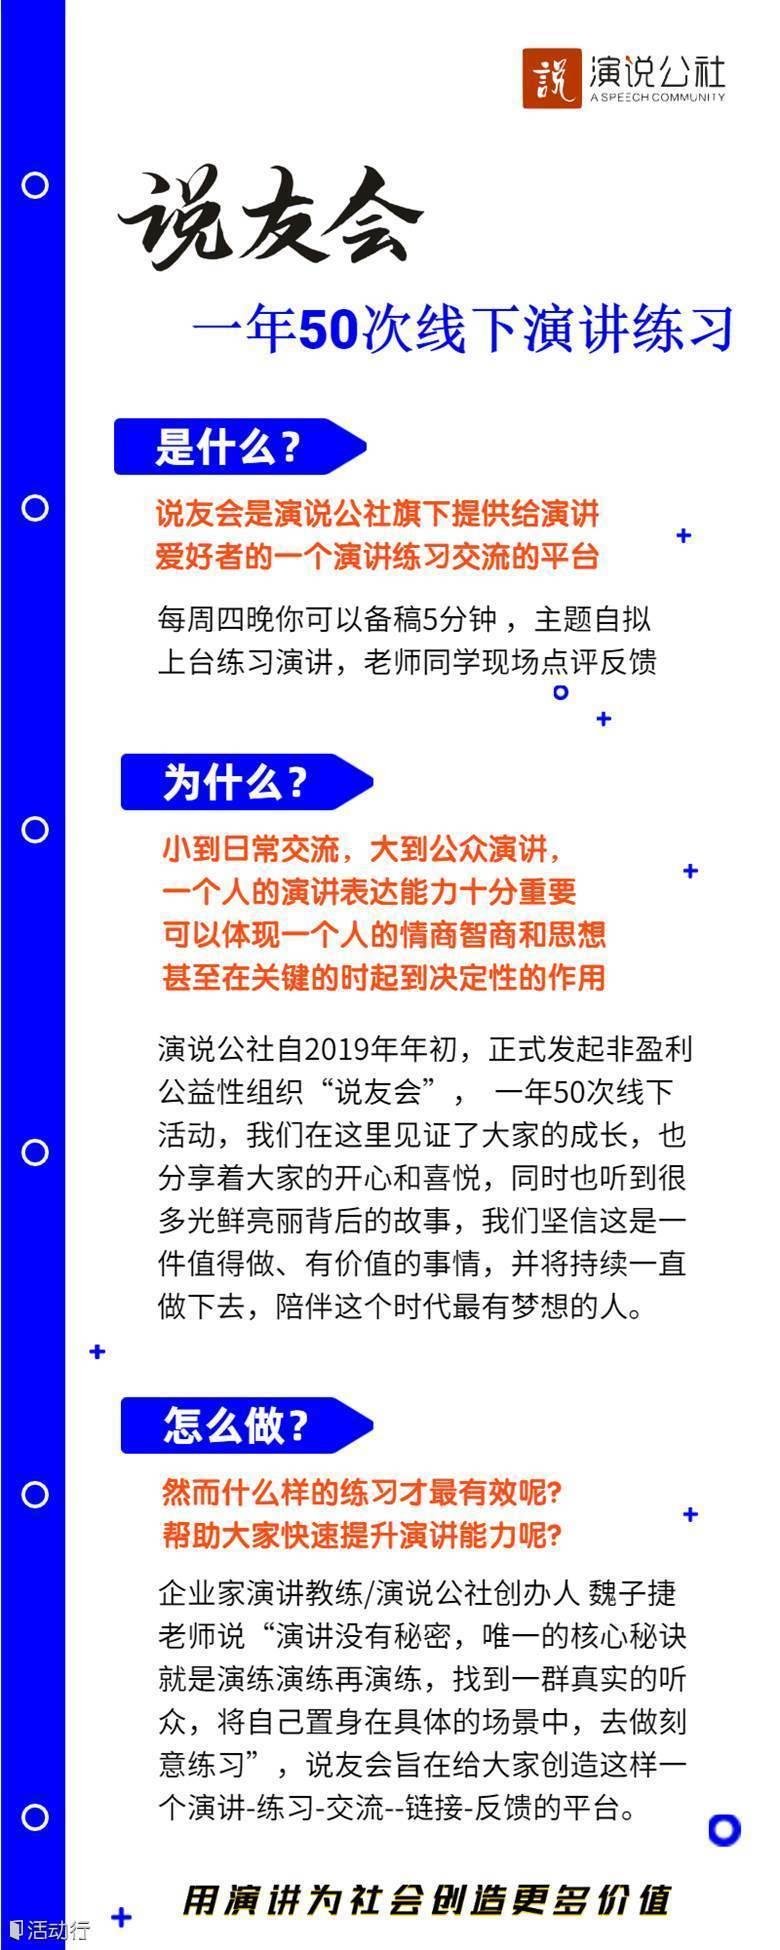 http://www.huodongxing.com/file/20201030/3043955848055/824173531400344.png